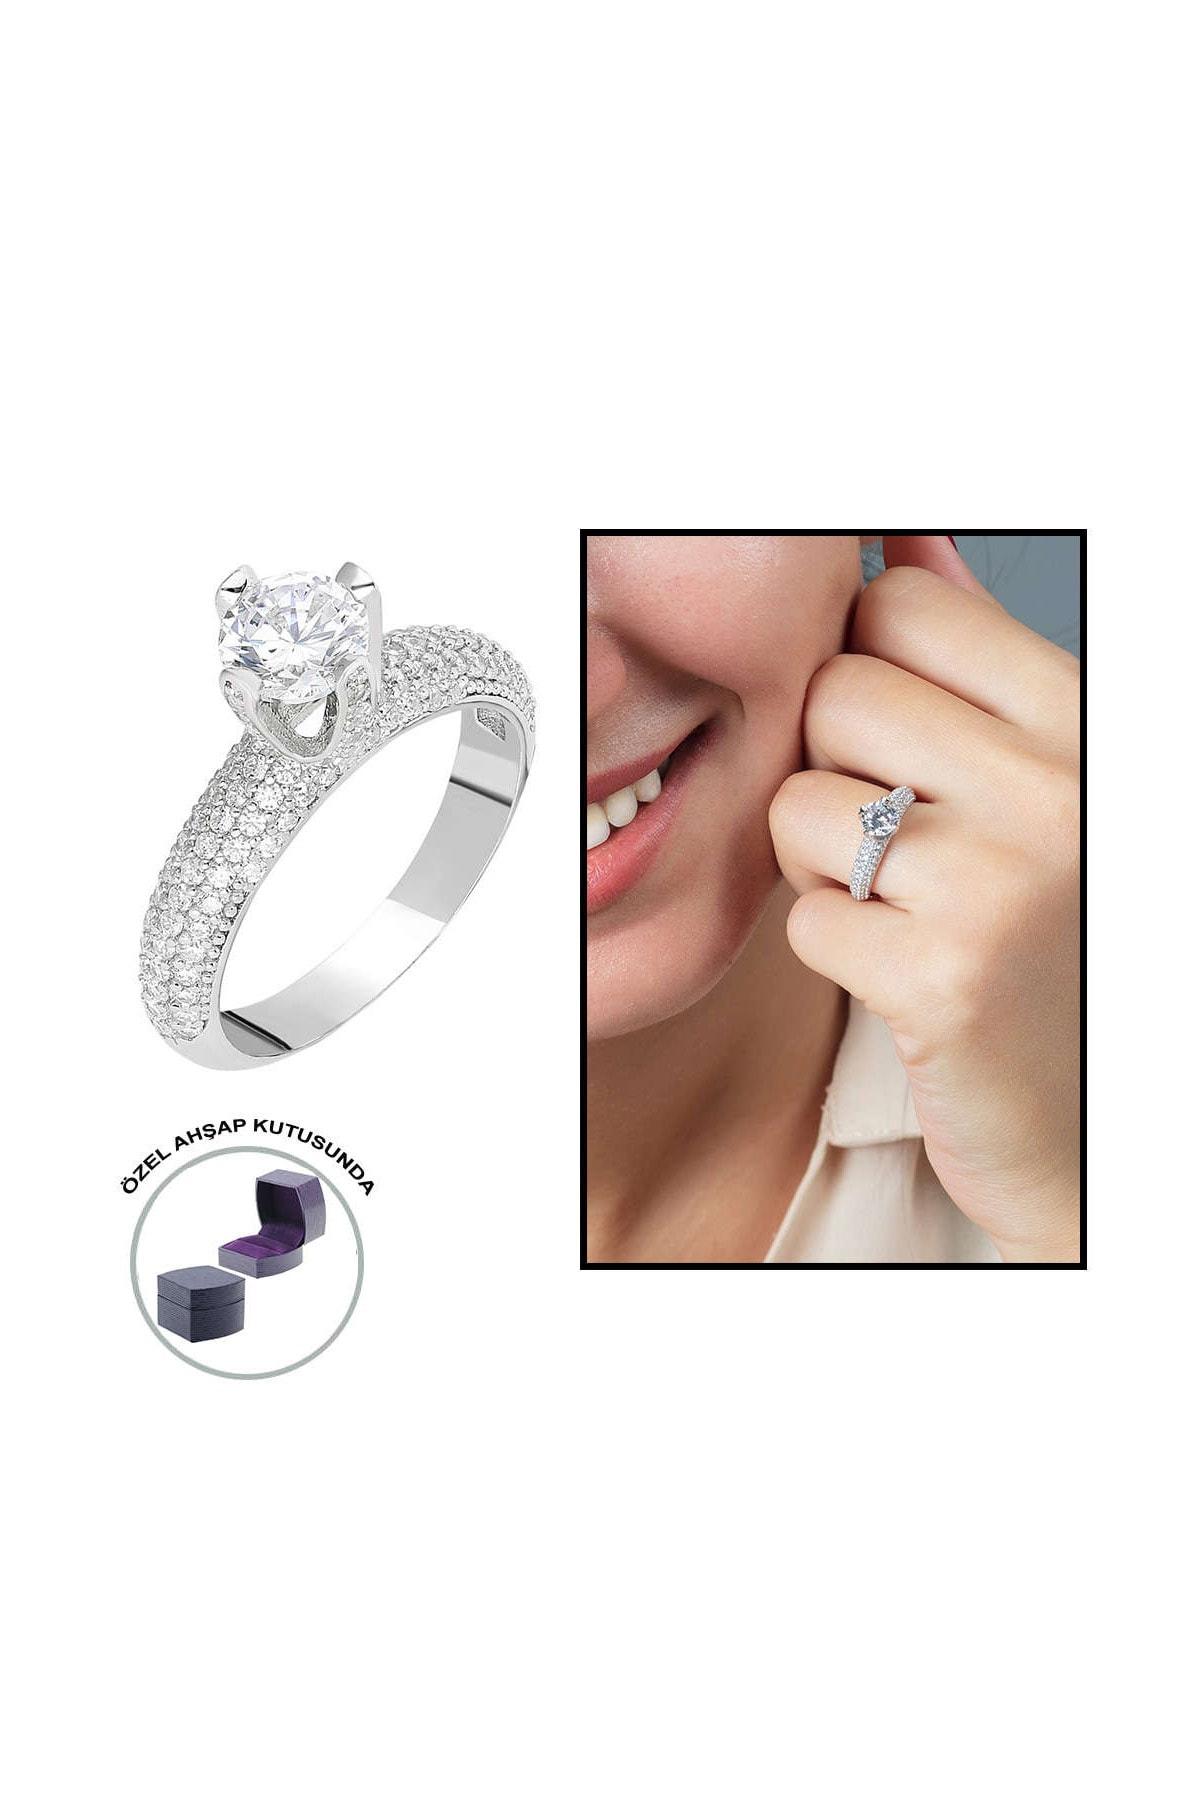 Tesbihane Starlight Diamond Pırlanta Montür Aşk Temalı 925 Ayar Gümüş Bayan Tektaş Yüzük 102001800 0